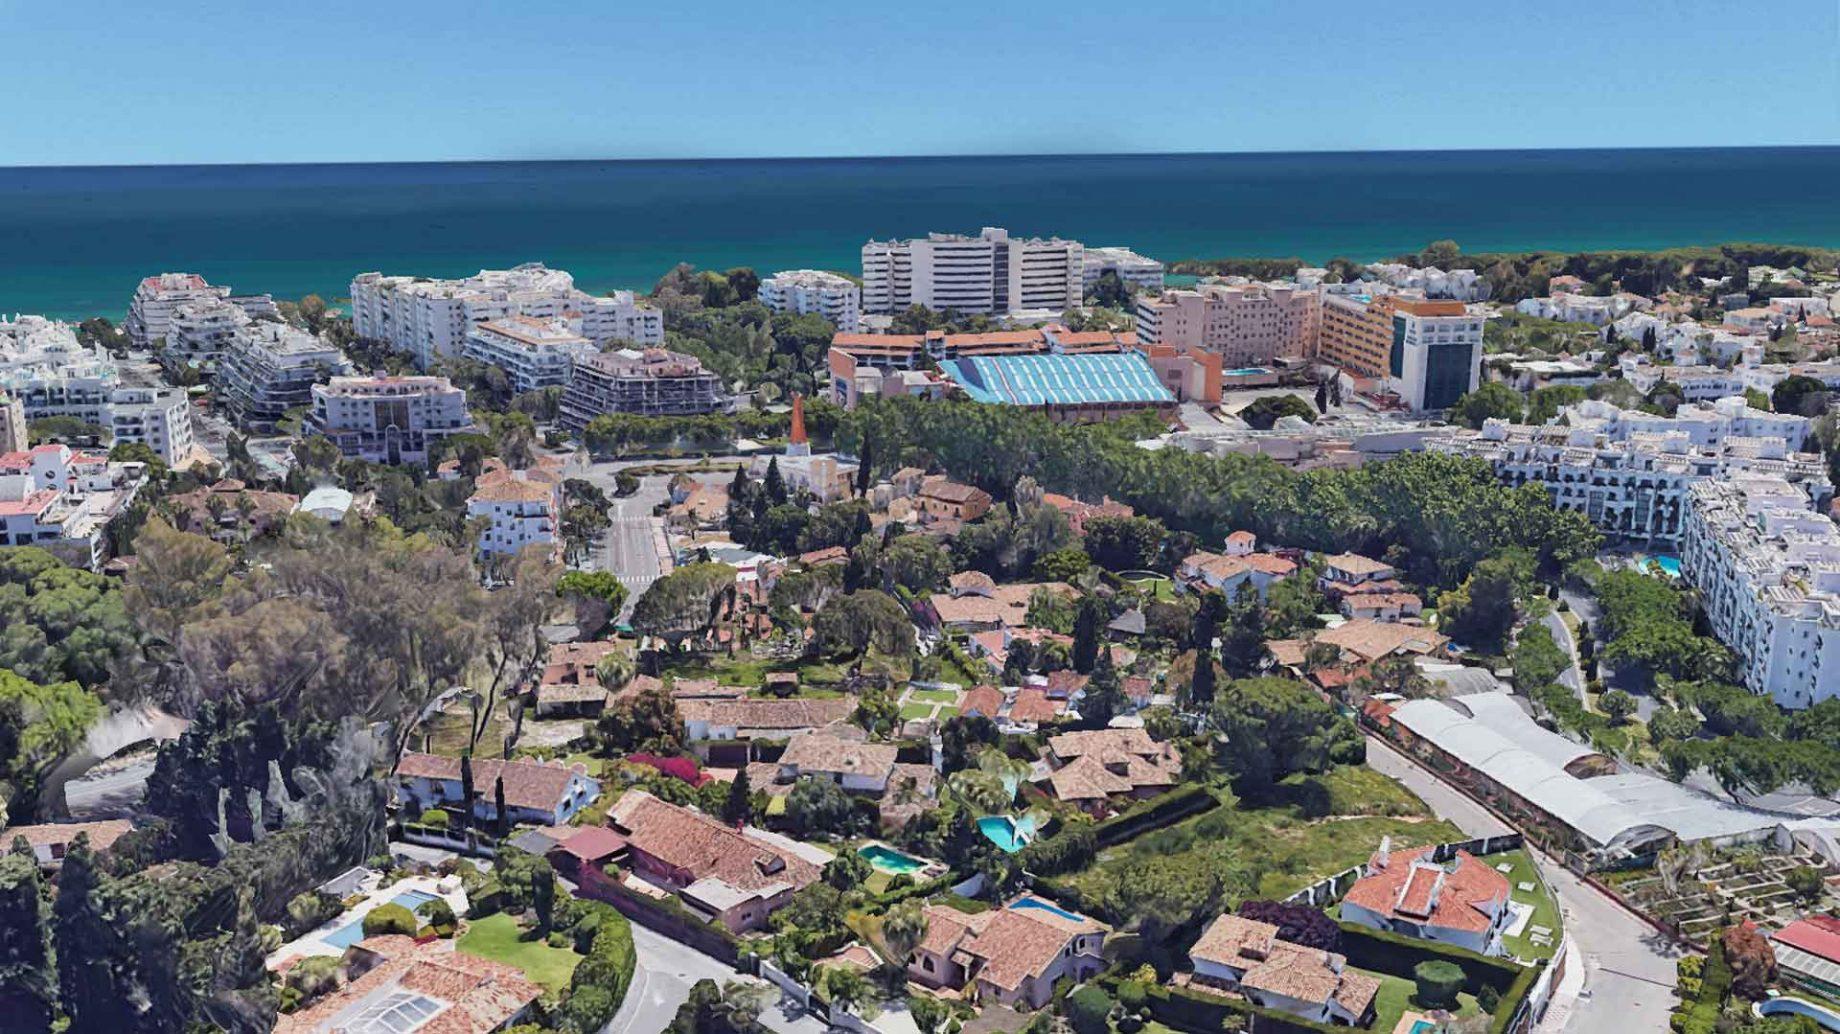 Aerial view of La Merced, area of villas in Marbella centre